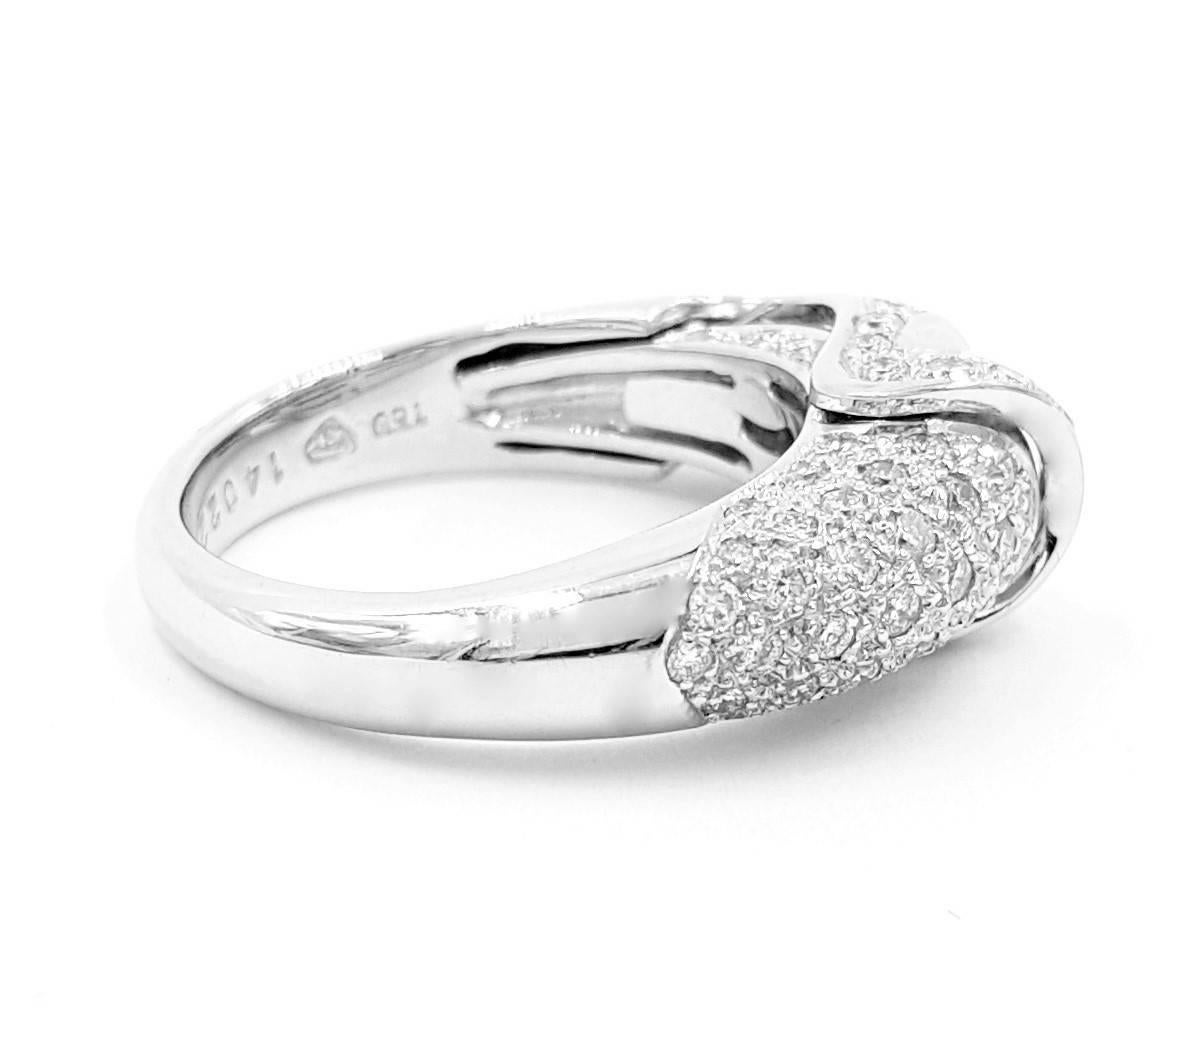 signed vasteros italy saddle 2 10 carats of diamonds and